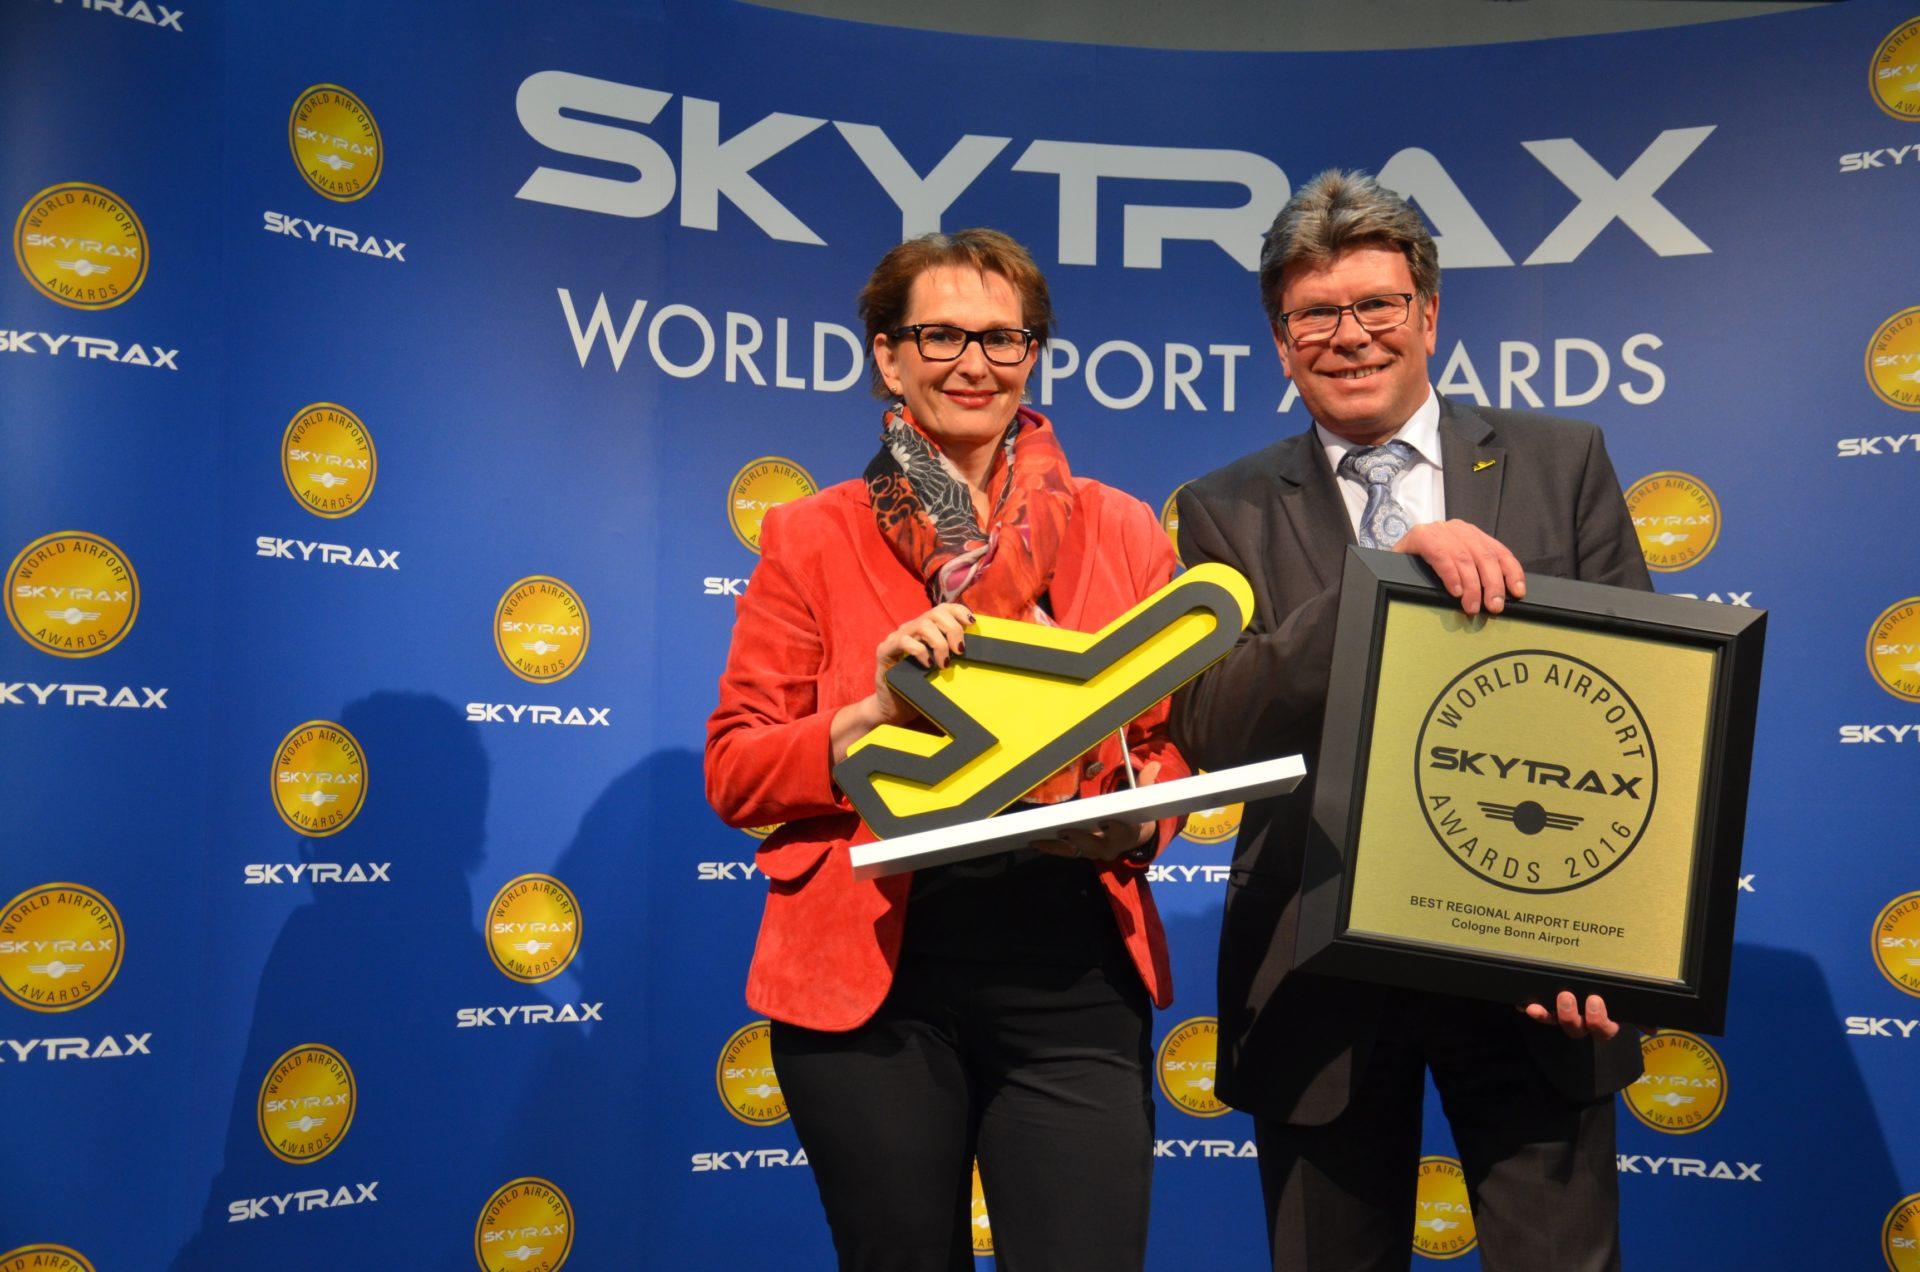 Skytrax-Awards: Flughafen Köln Bonn erneut Europas Nr. 1 copyright: Köln Bonn Airport